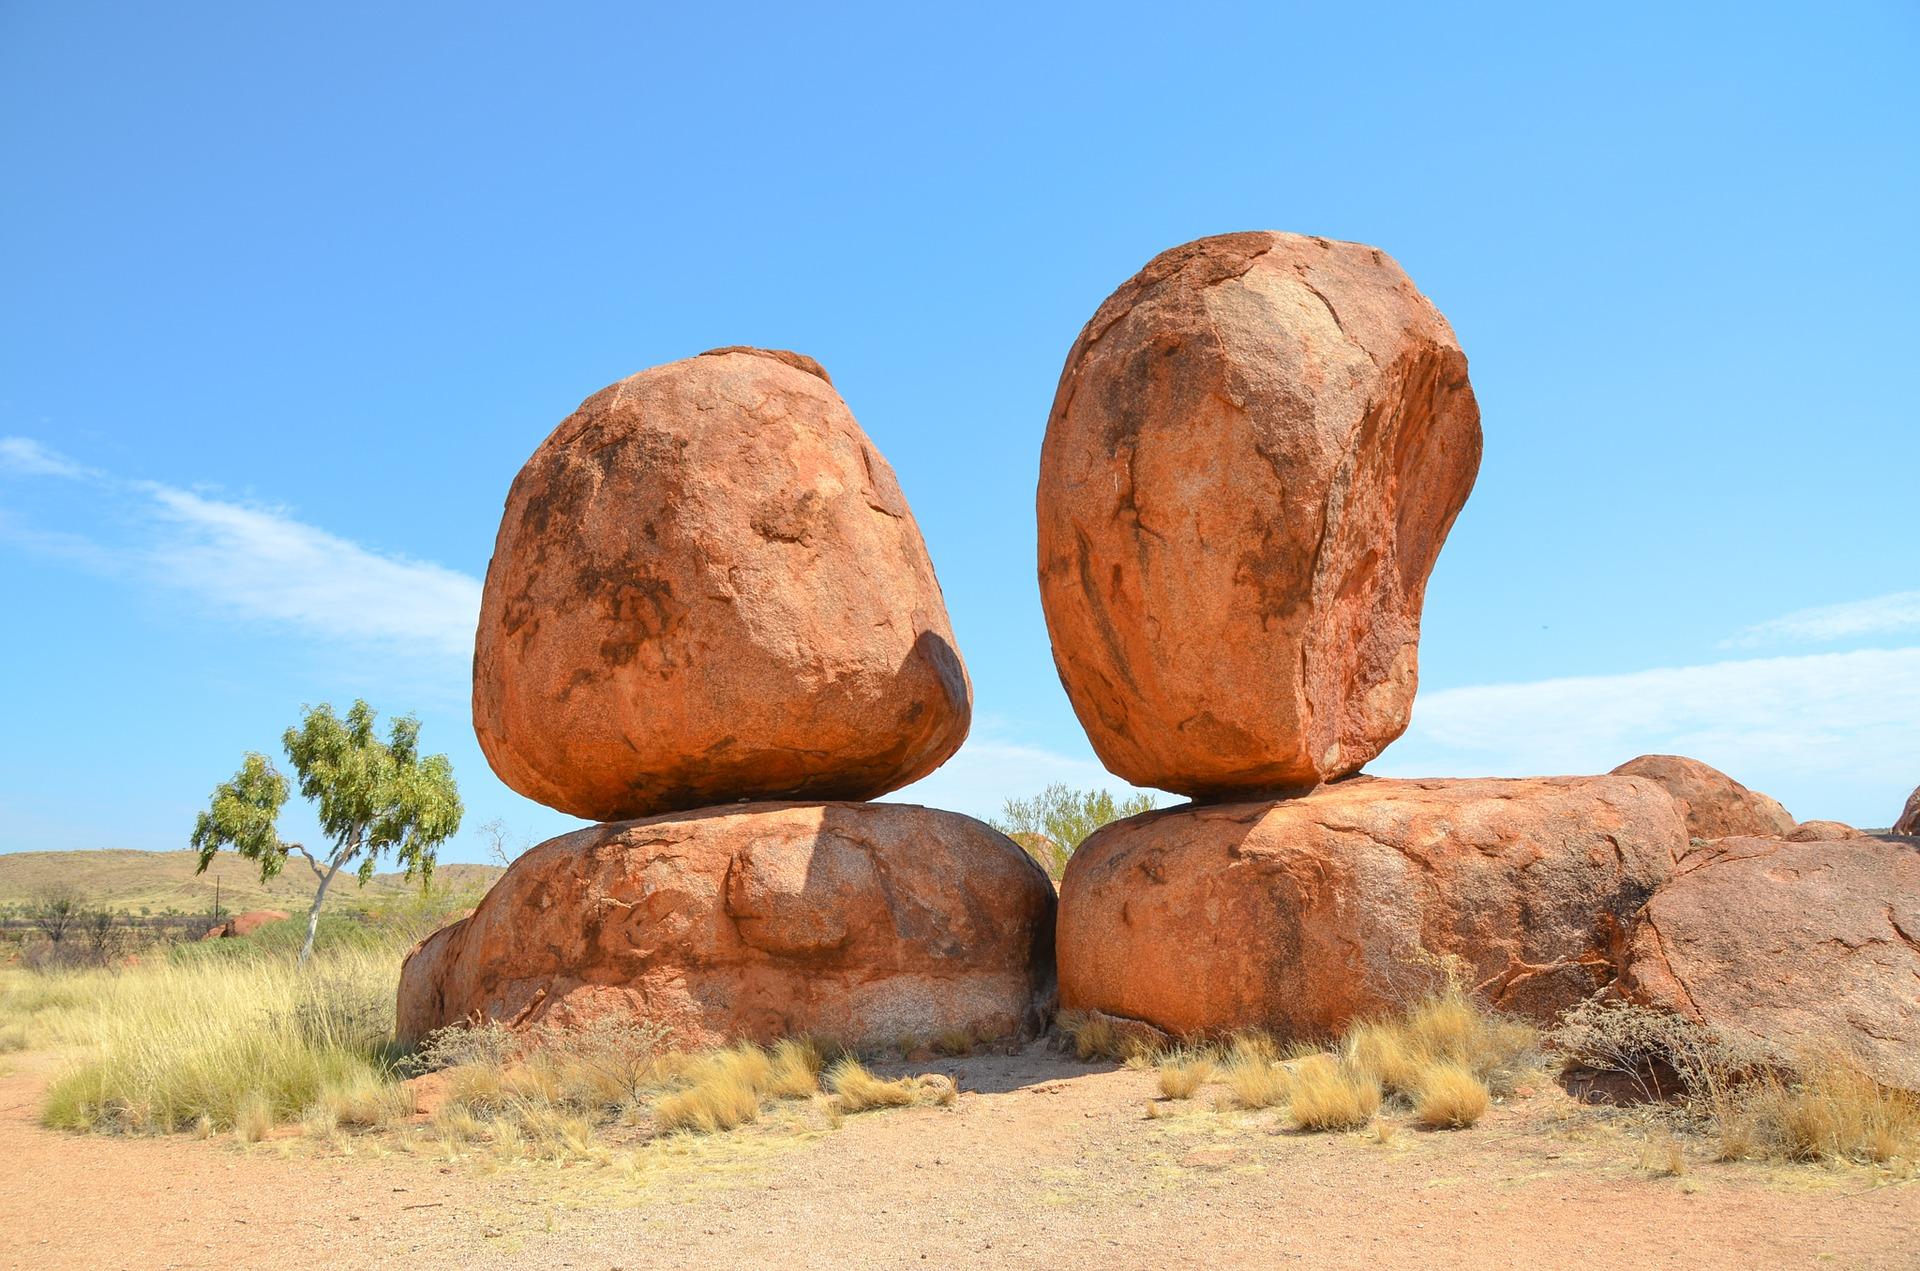 snackenglish, snack, rock, boulder, pedrusco, peñasco, paramo, desierto